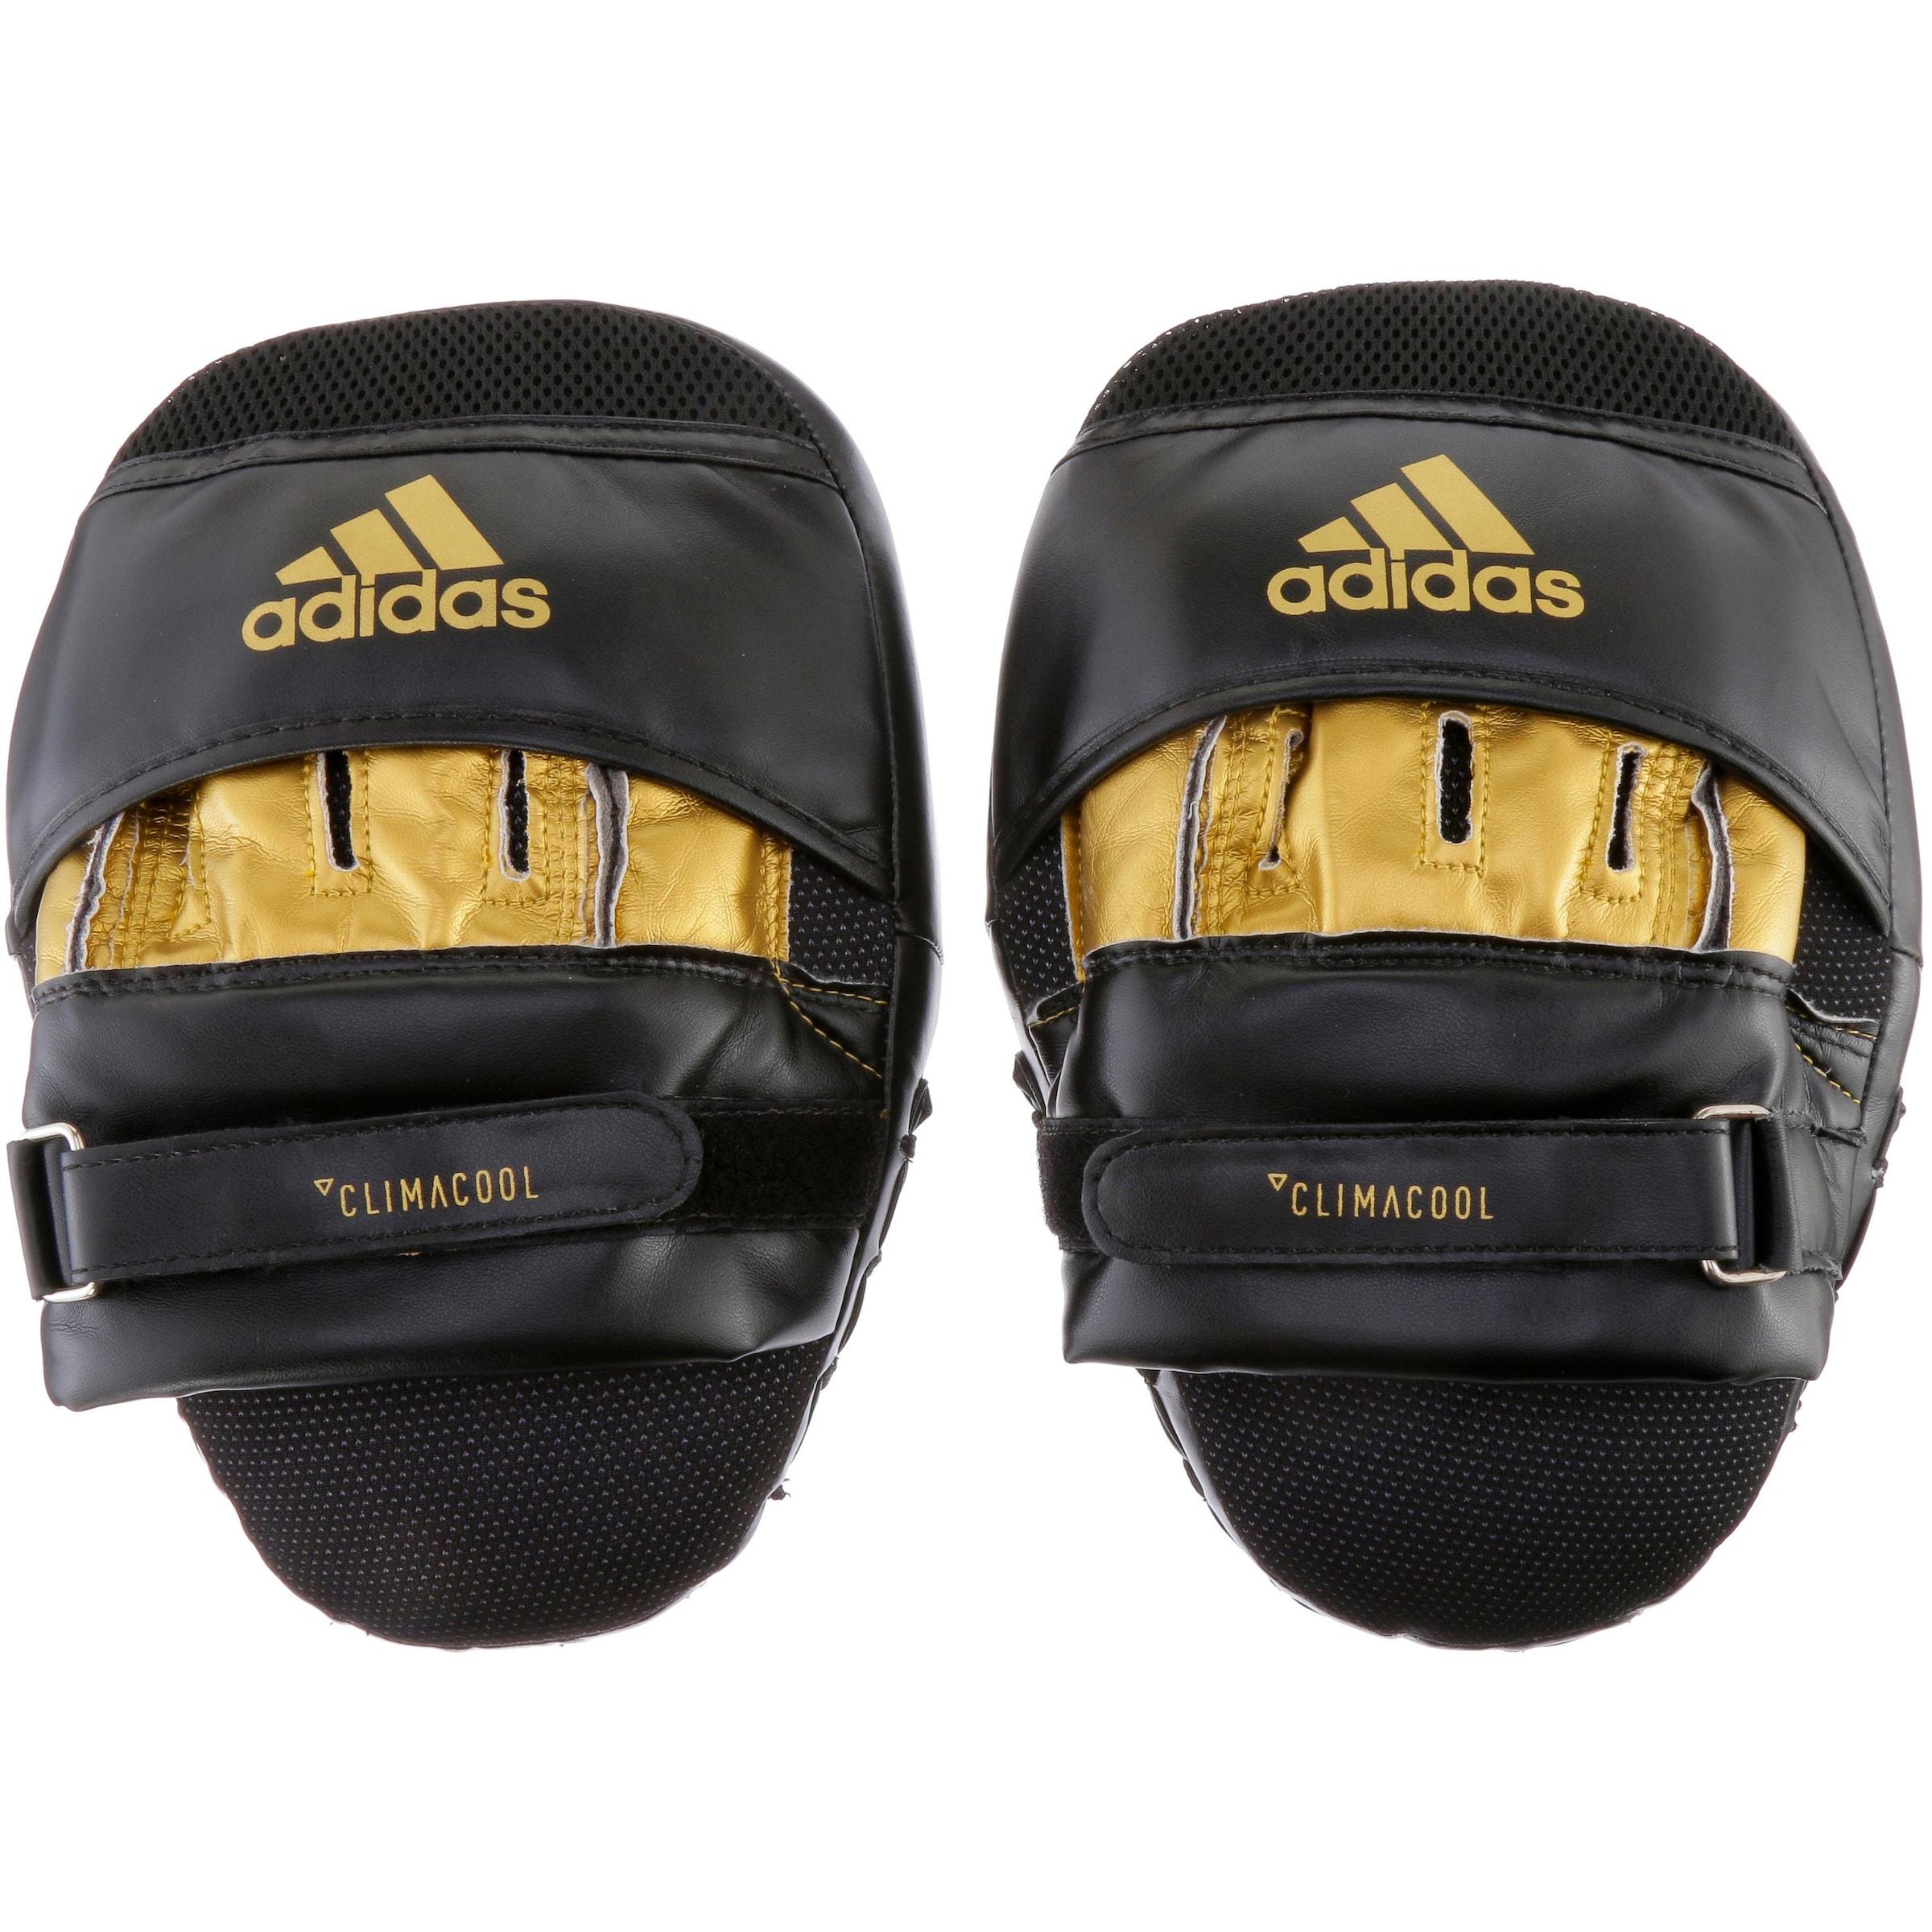 Adidas Boxhandschuhe Performance Performance In Boxhandschuhe In GoldSchwarz GoldSchwarz Adidas Adidas Performance Boxhandschuhe Aj4LqR3c5